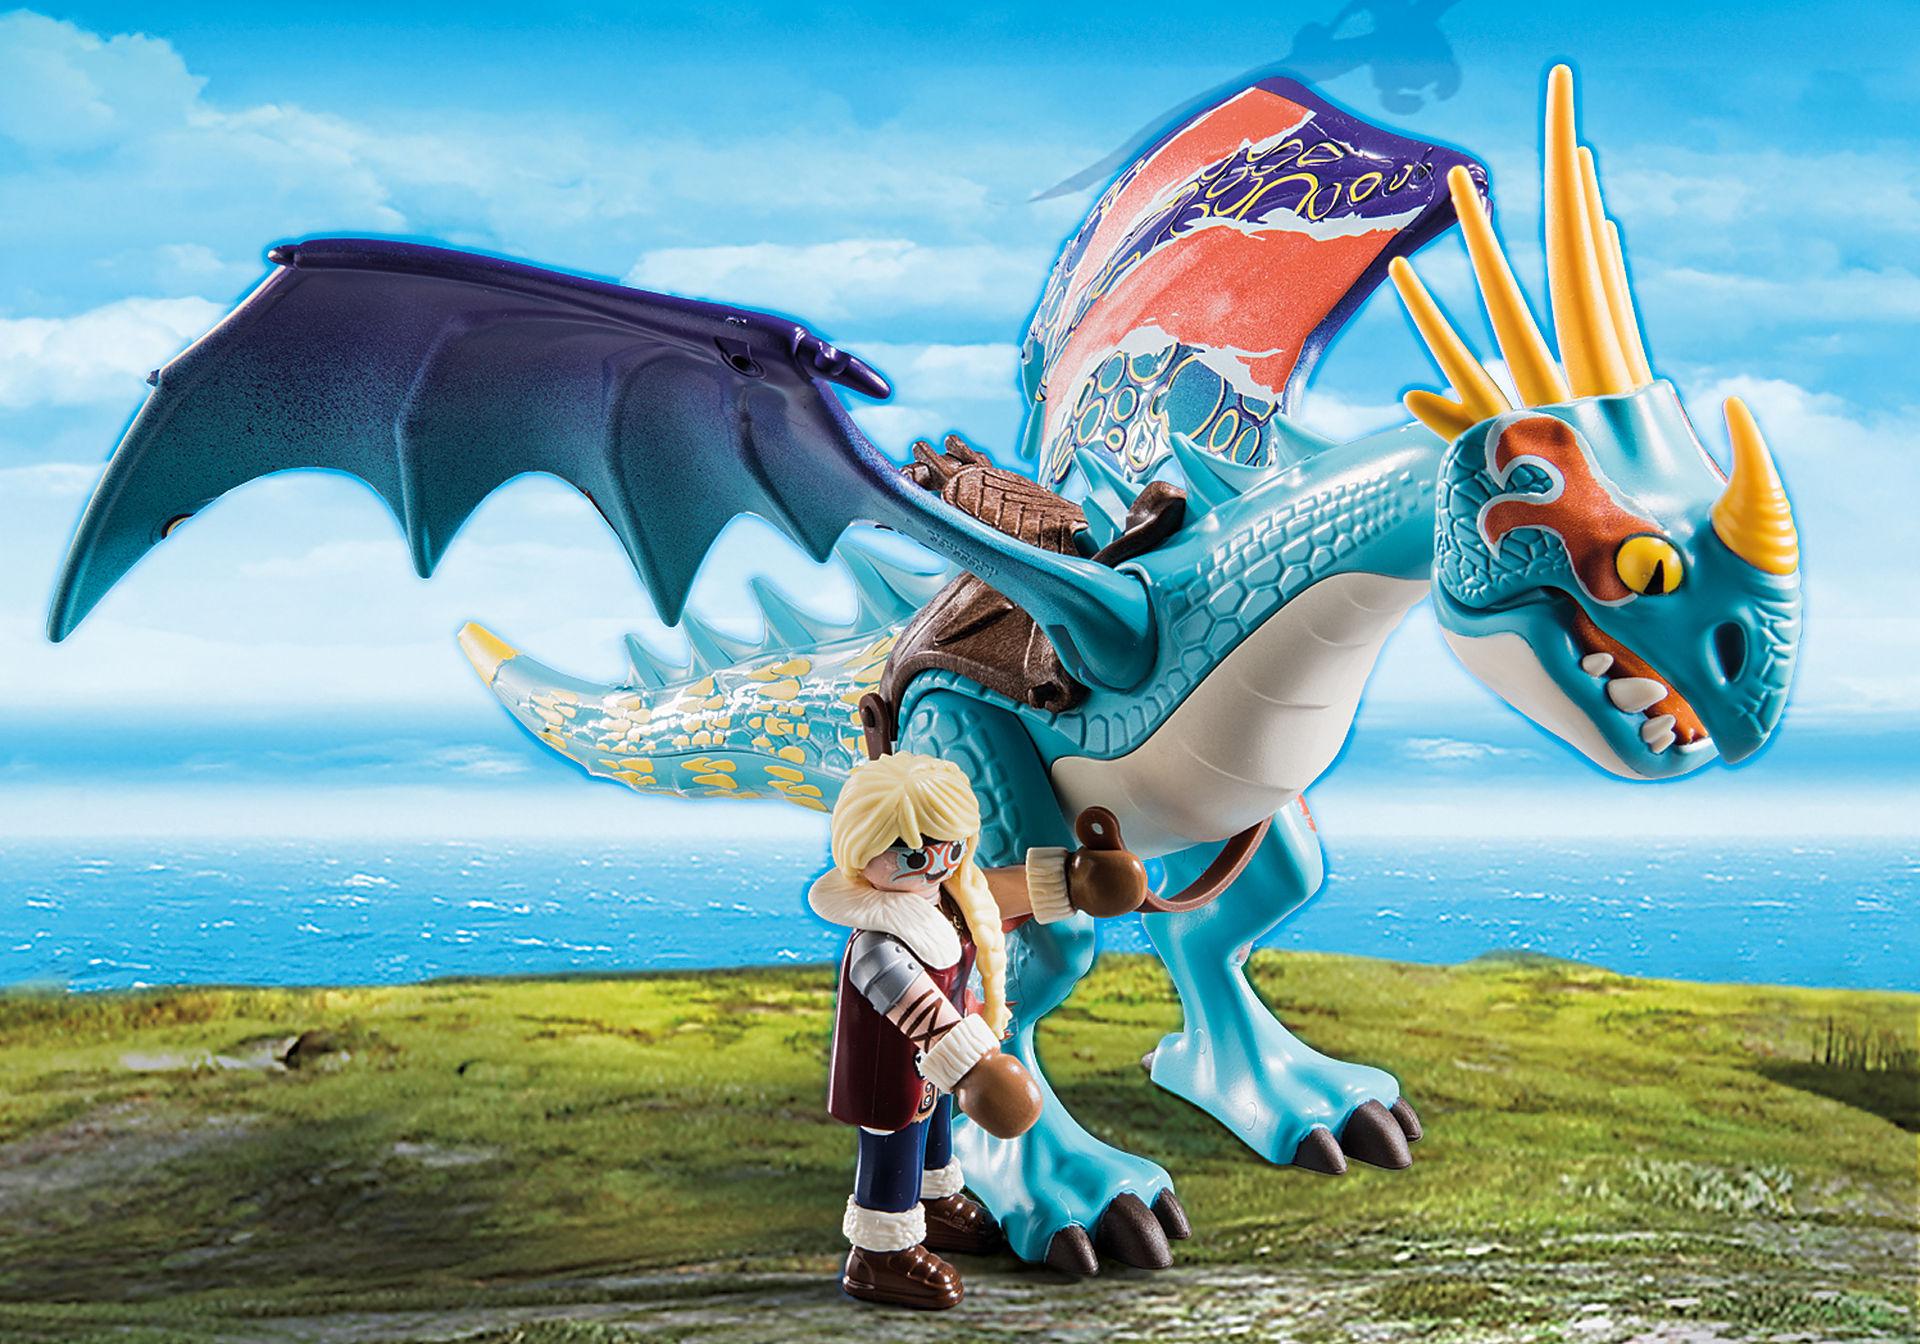 70728 Dragon Racing: Astrid i Wichura zoom image4